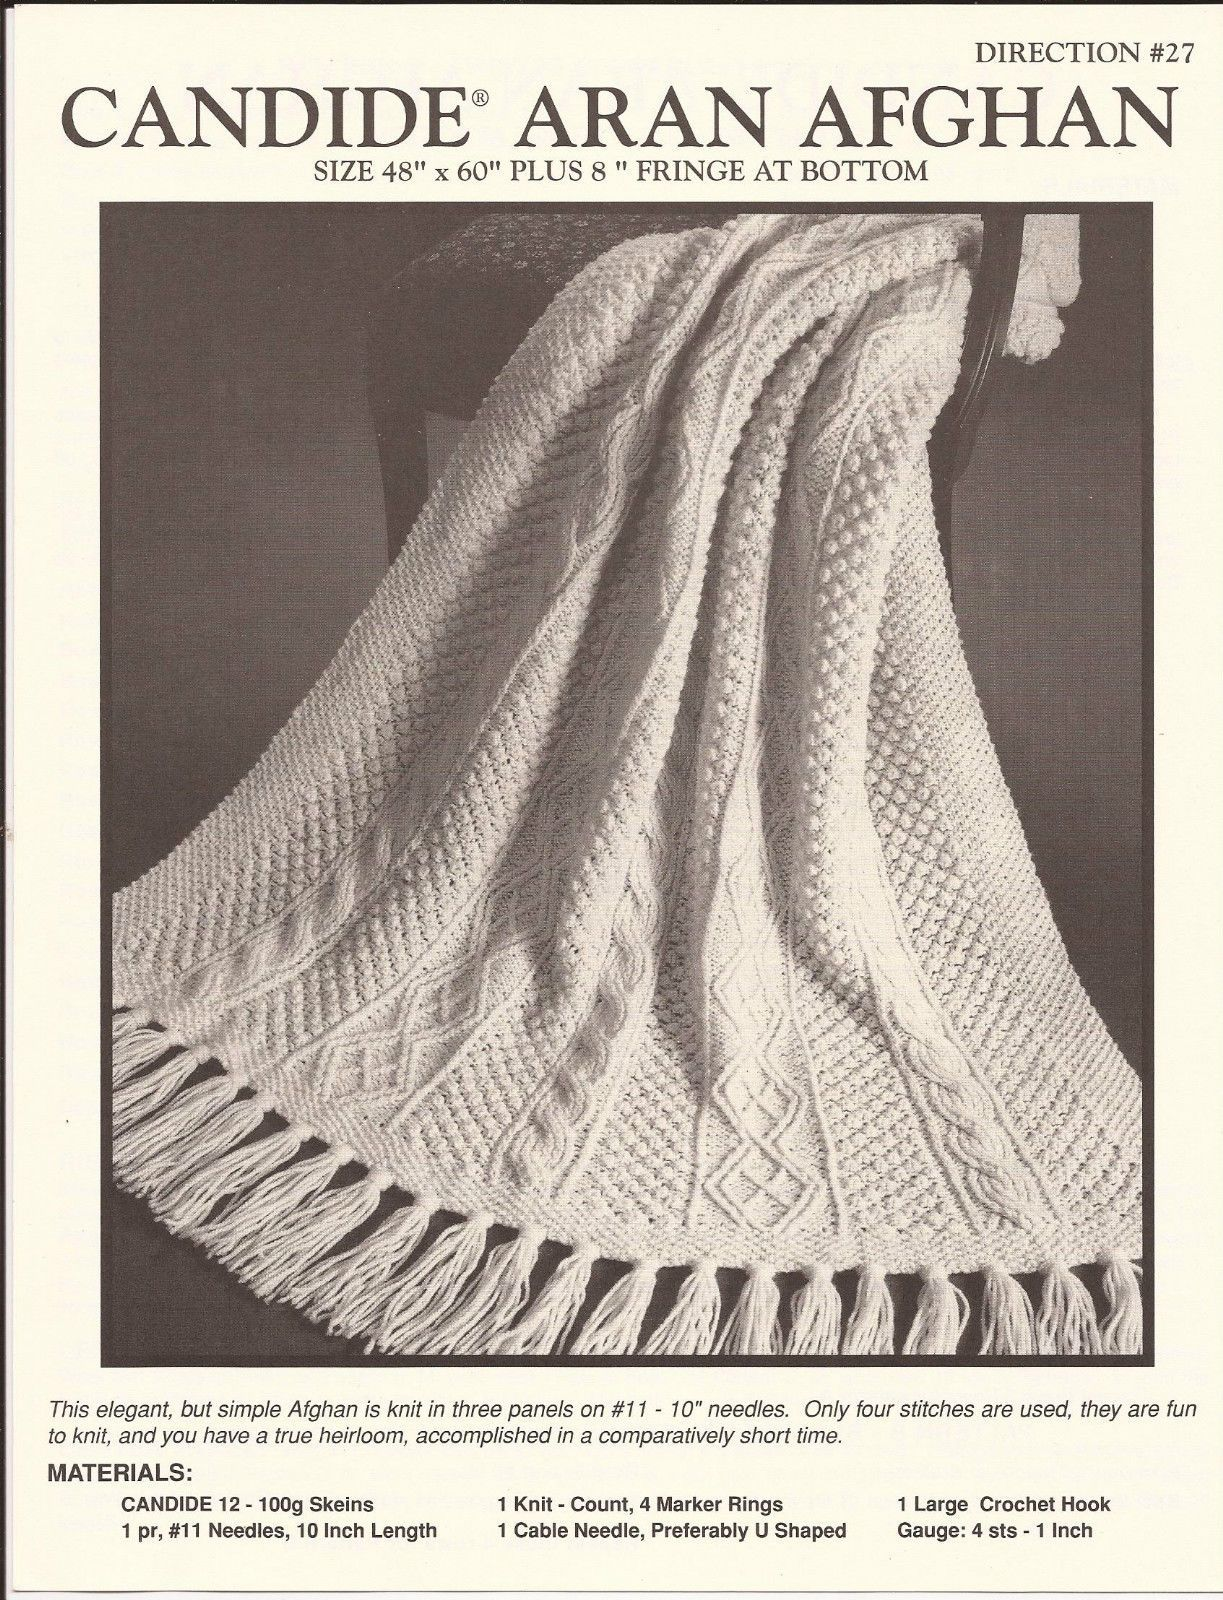 Reynolds candide aran afghan knitting pattern 27 pattern only reynolds candide aran afghan knitting pattern 27 pattern only ebay bankloansurffo Choice Image